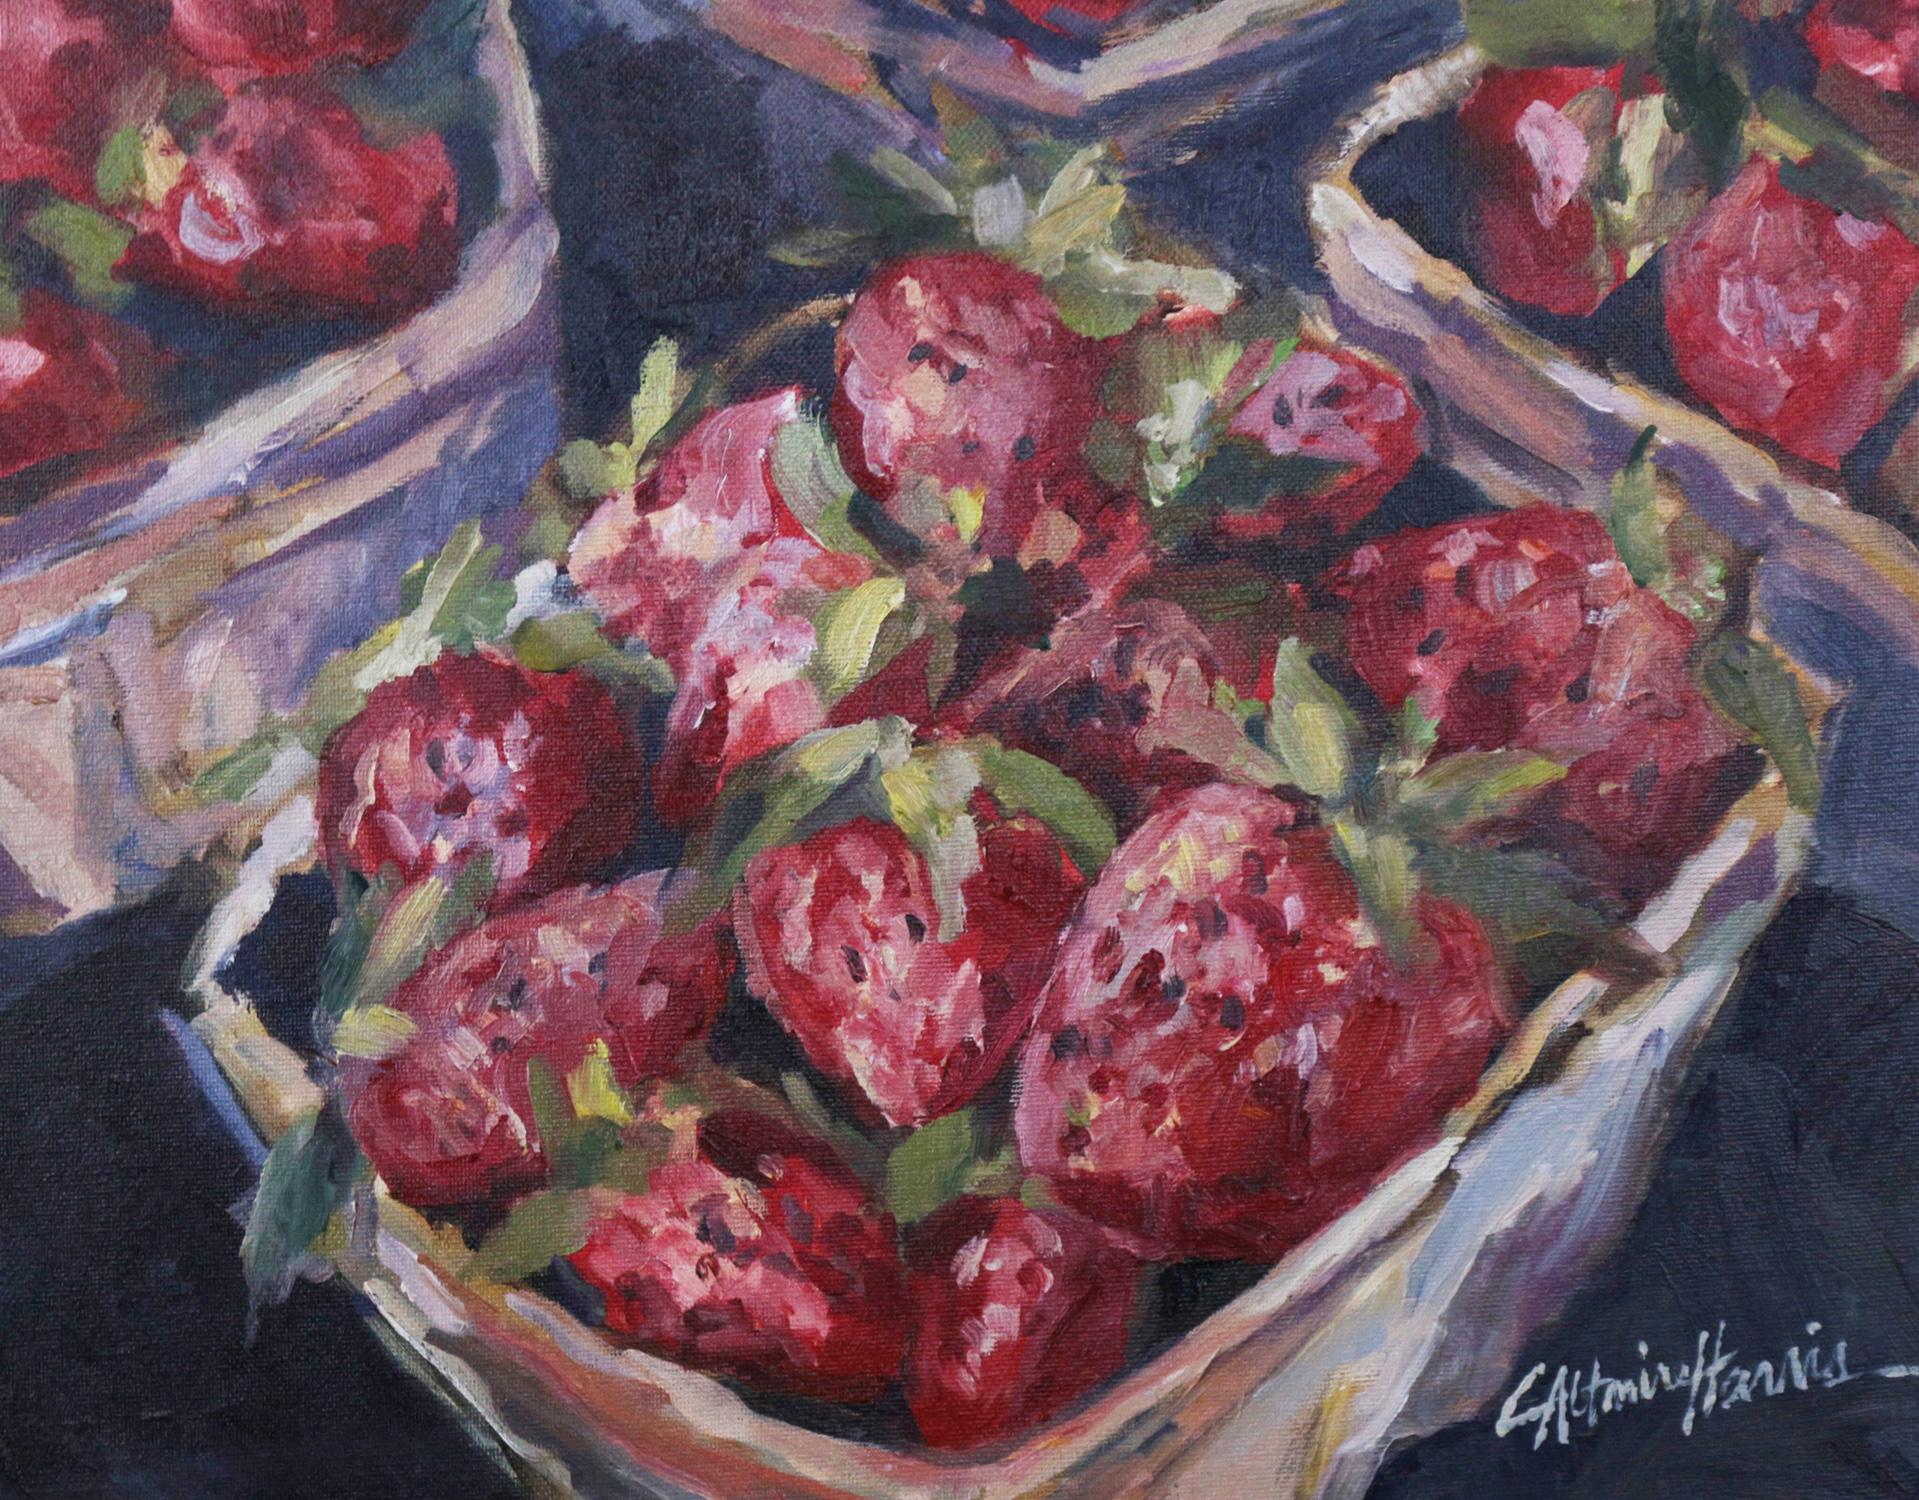 Strawberries at Whites Market